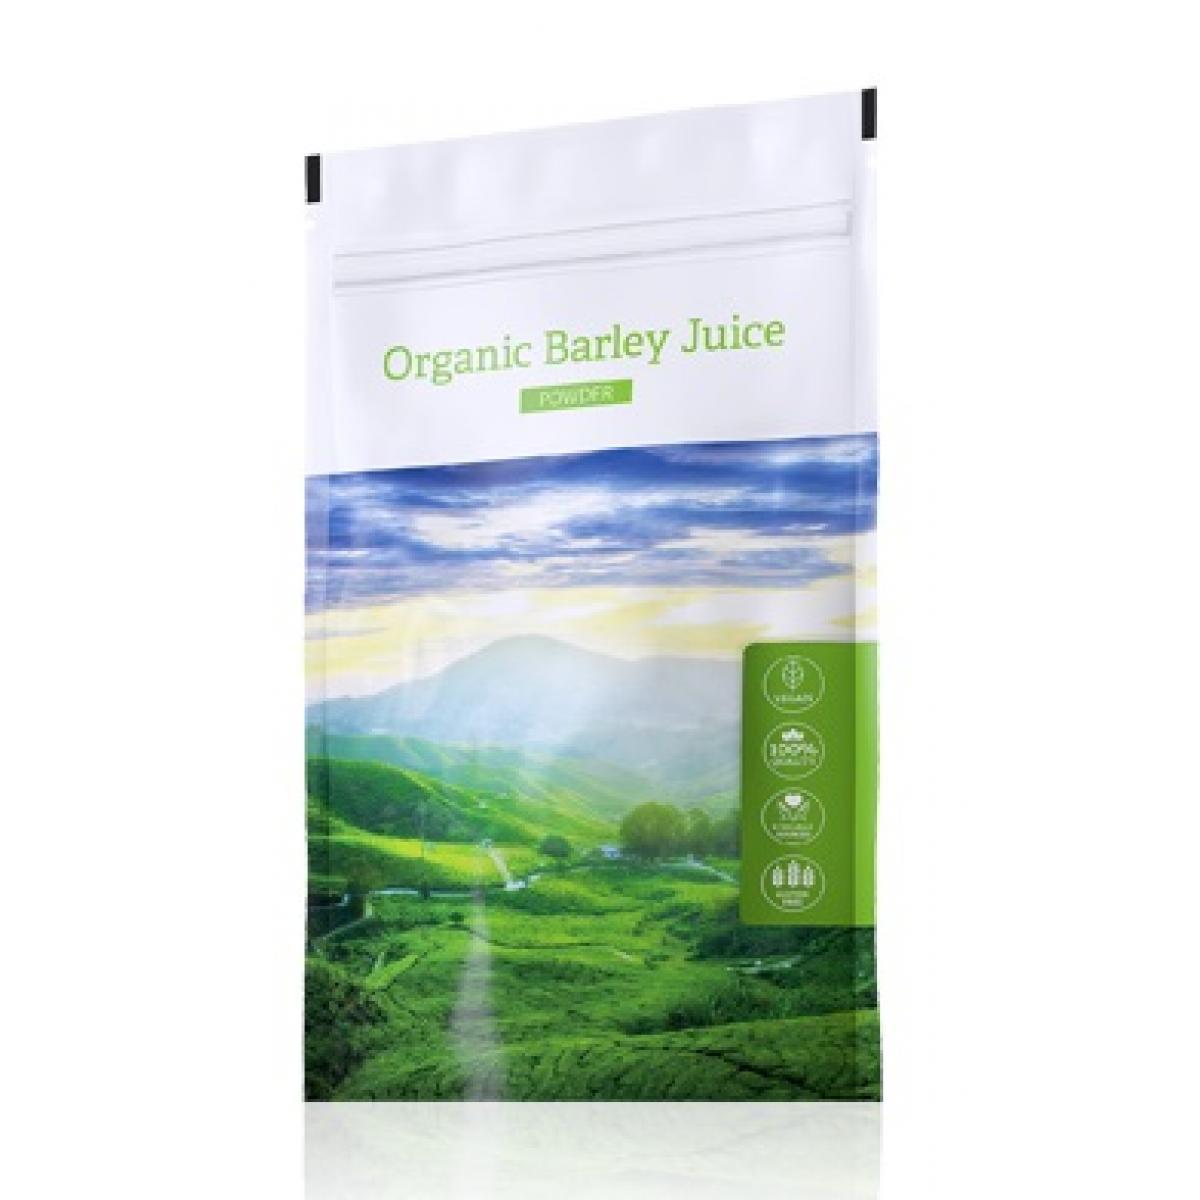 Organic Barley Juice Powder - 100 g